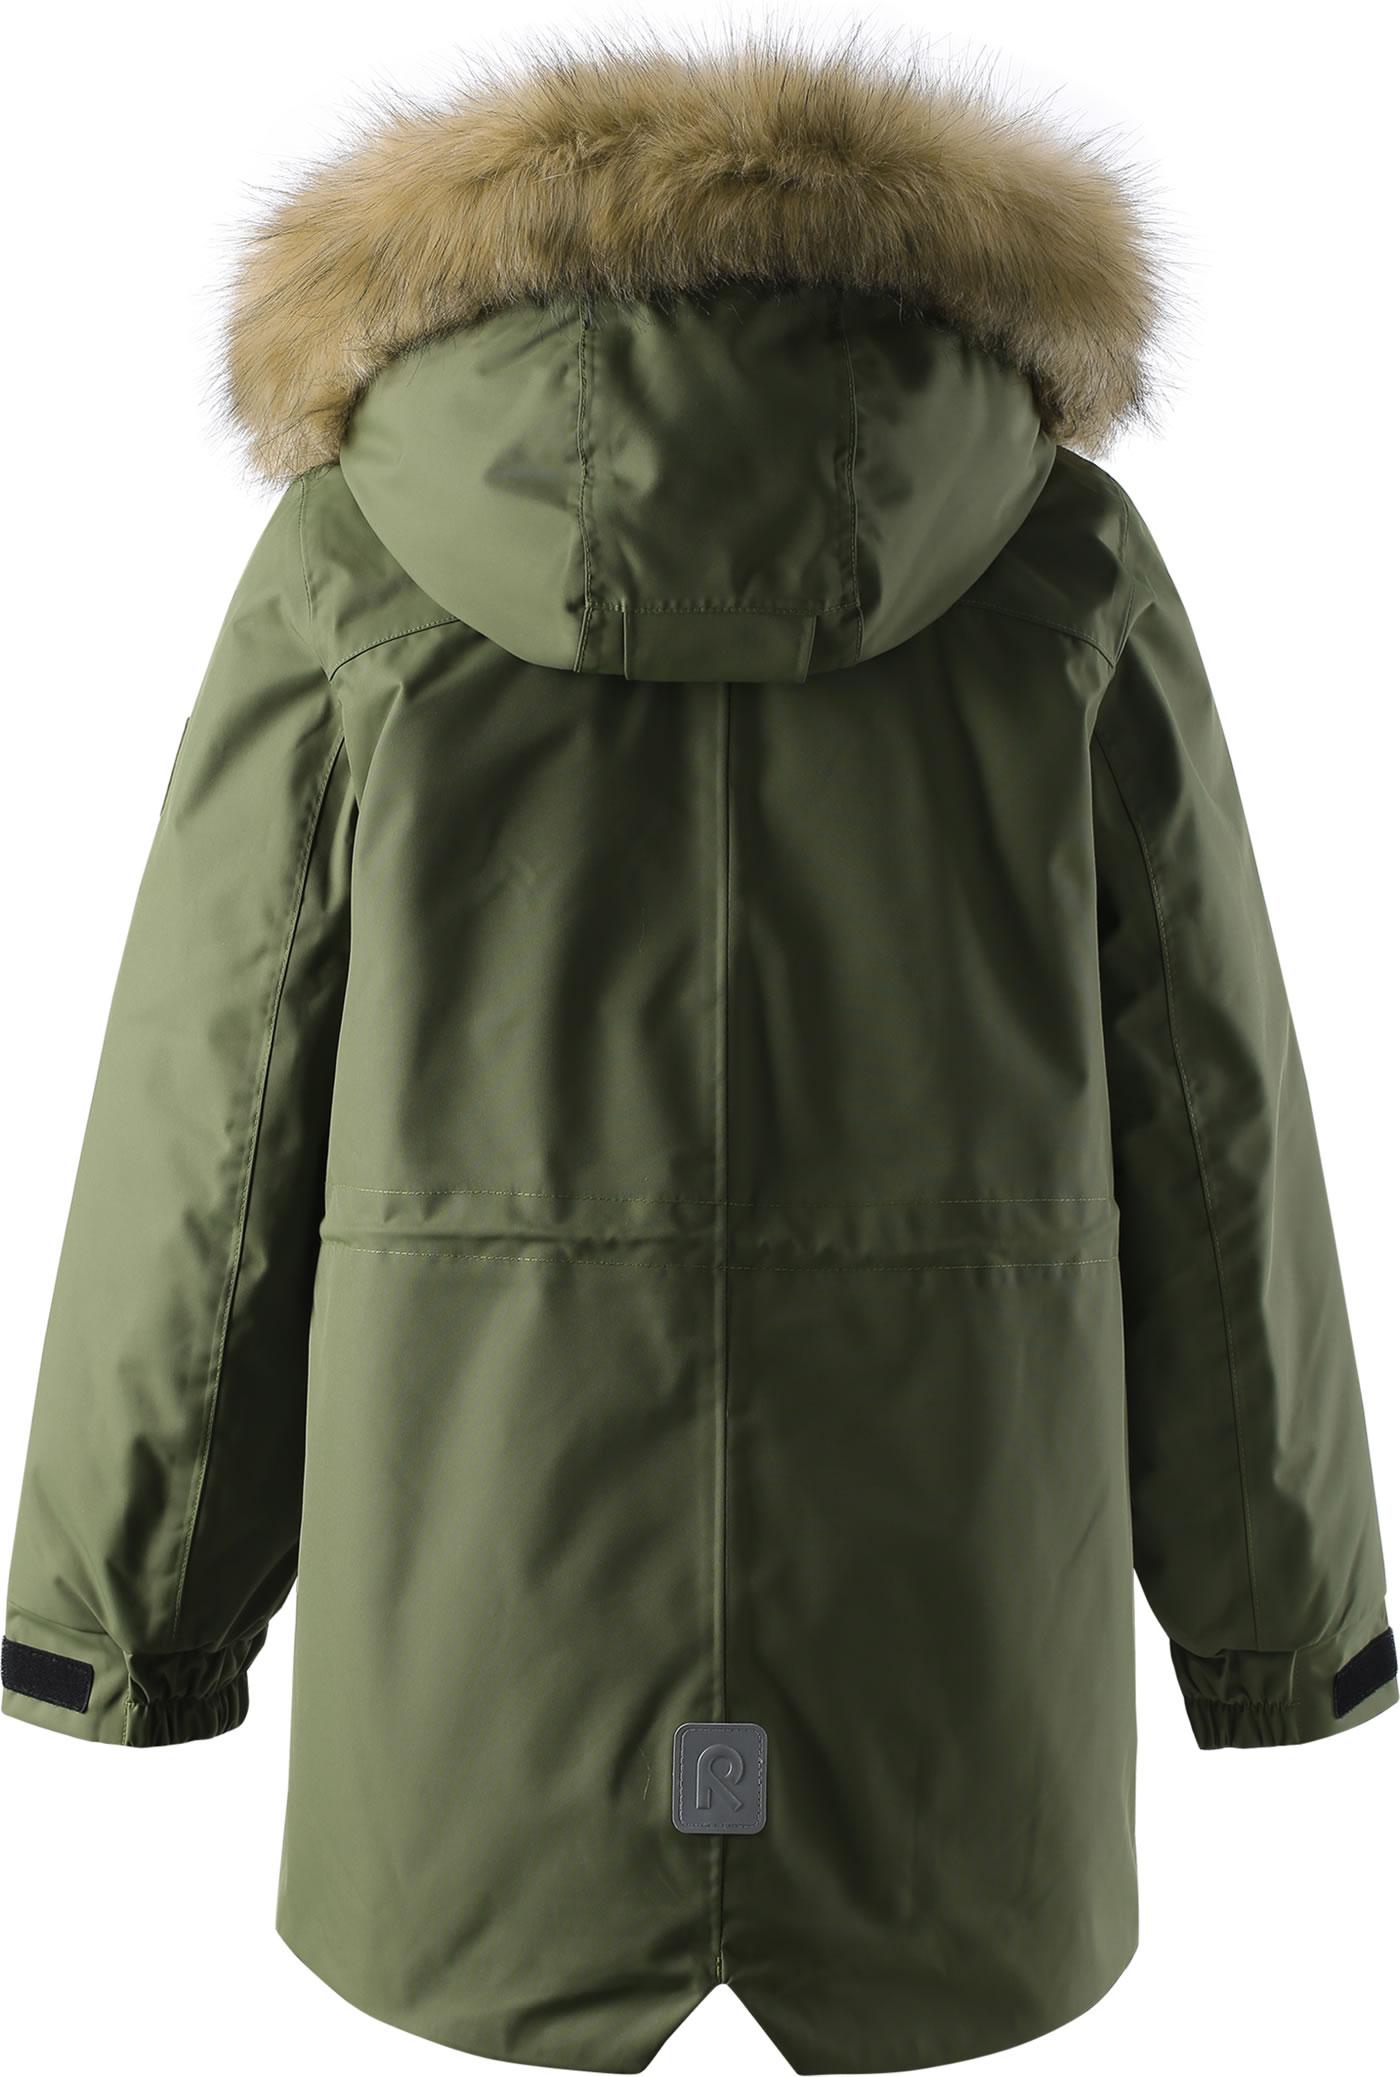 detailed look f59fc dcc22 Reima Winterjacke / Parka Reimatec® NAAPURI khaki green 531351-8930